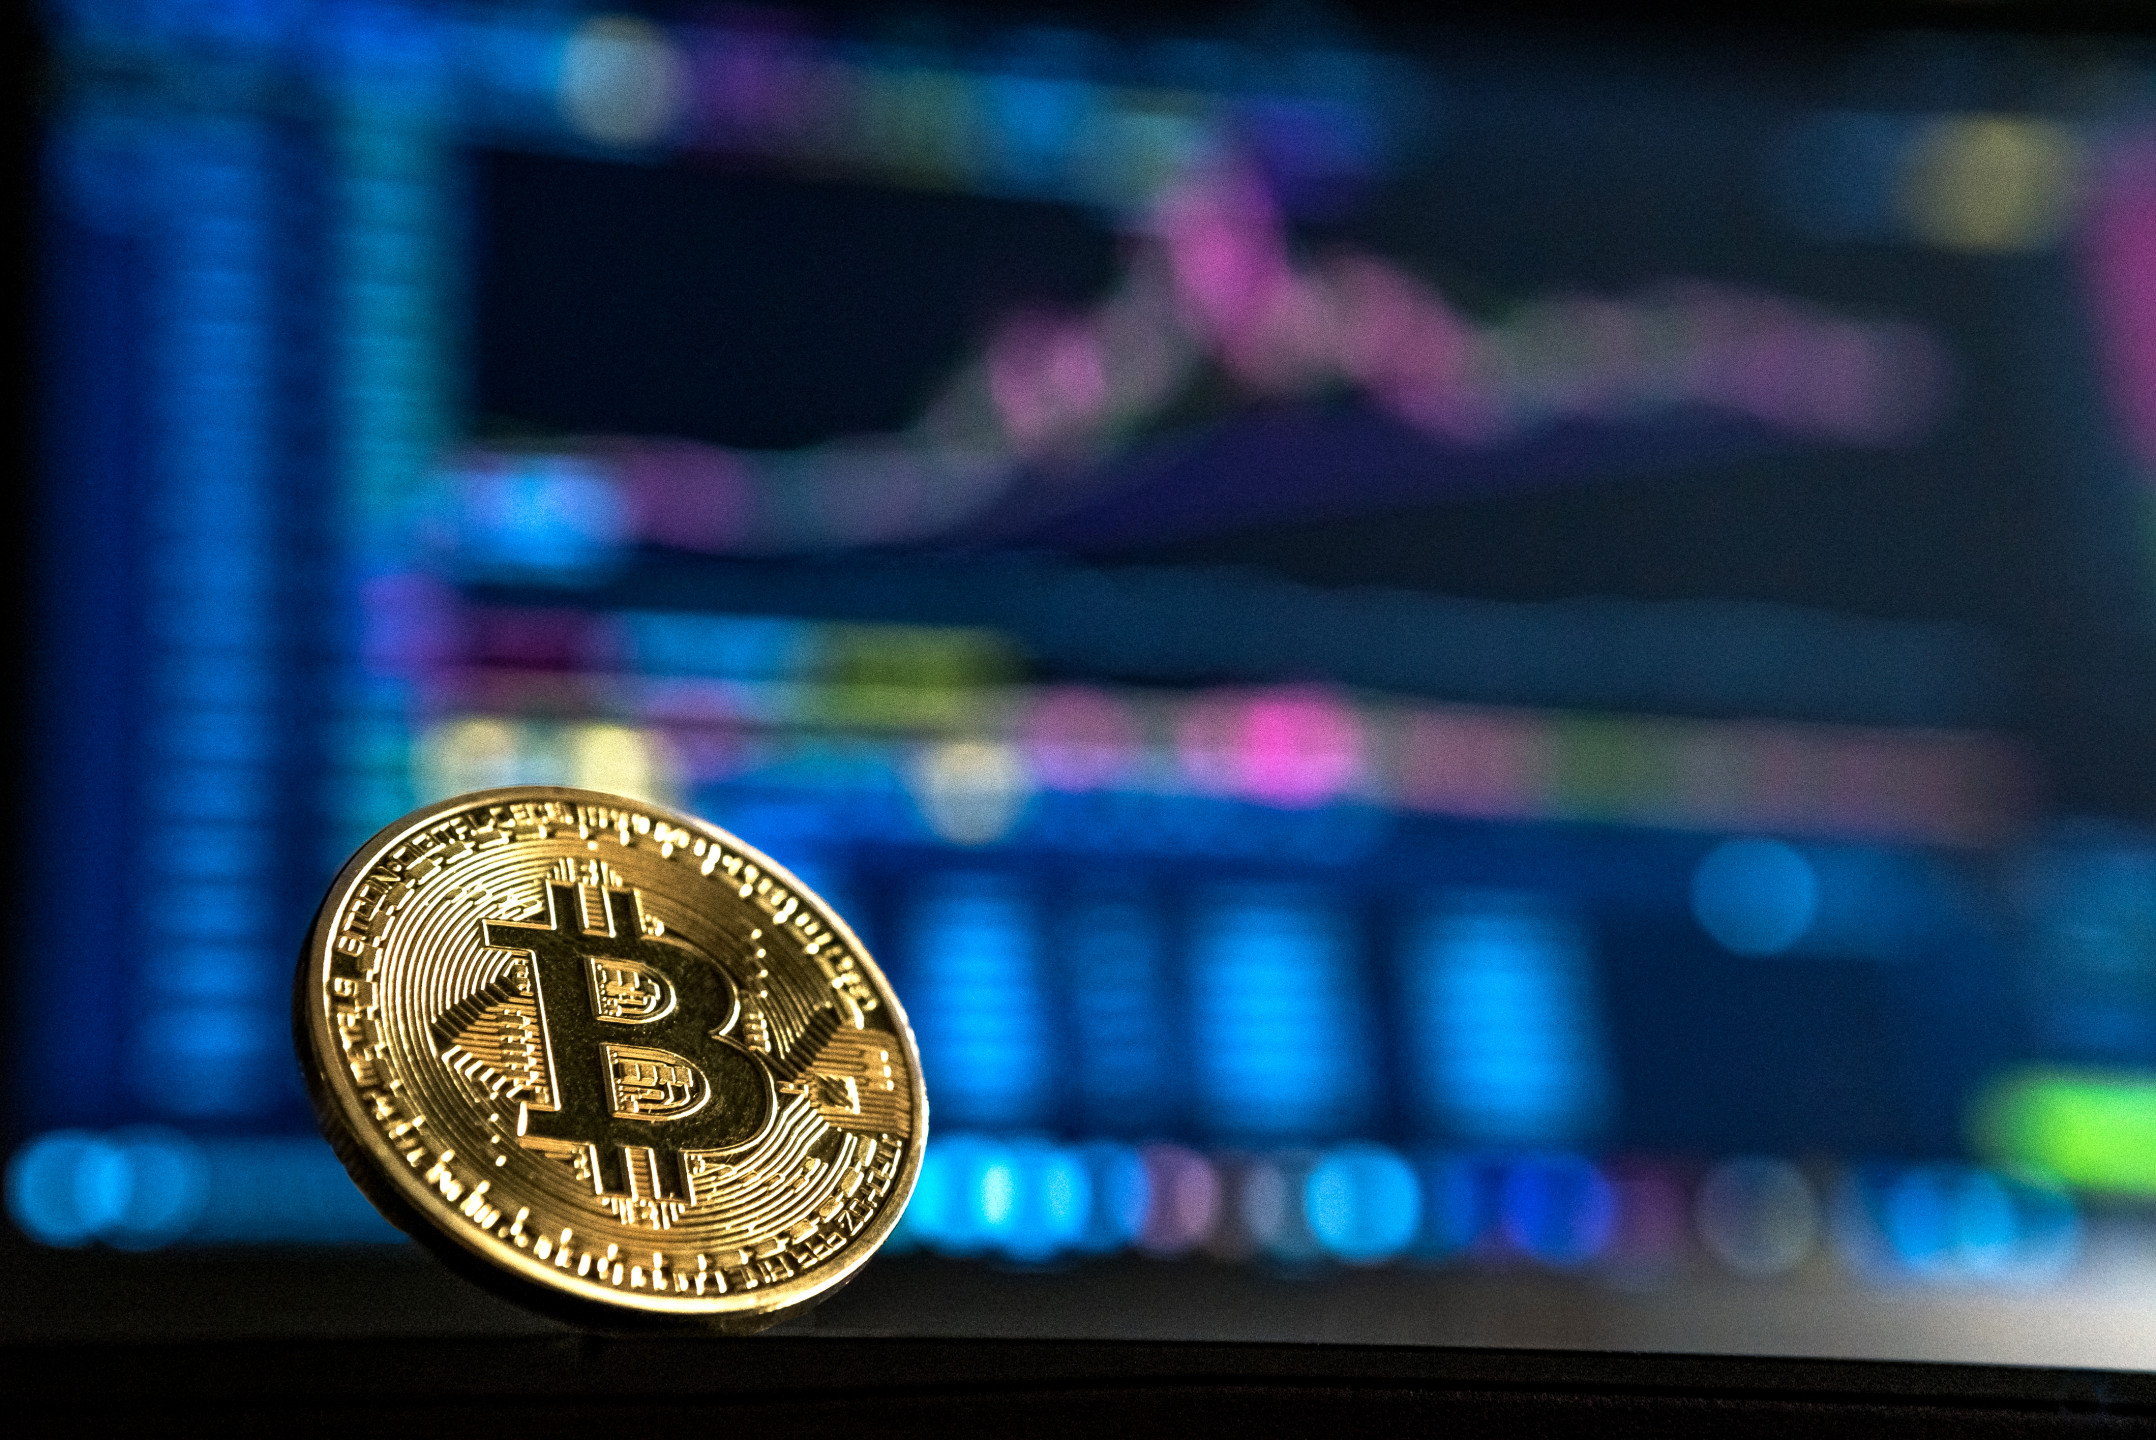 Bitcoin 2019 predictions: Crypto winter will end?